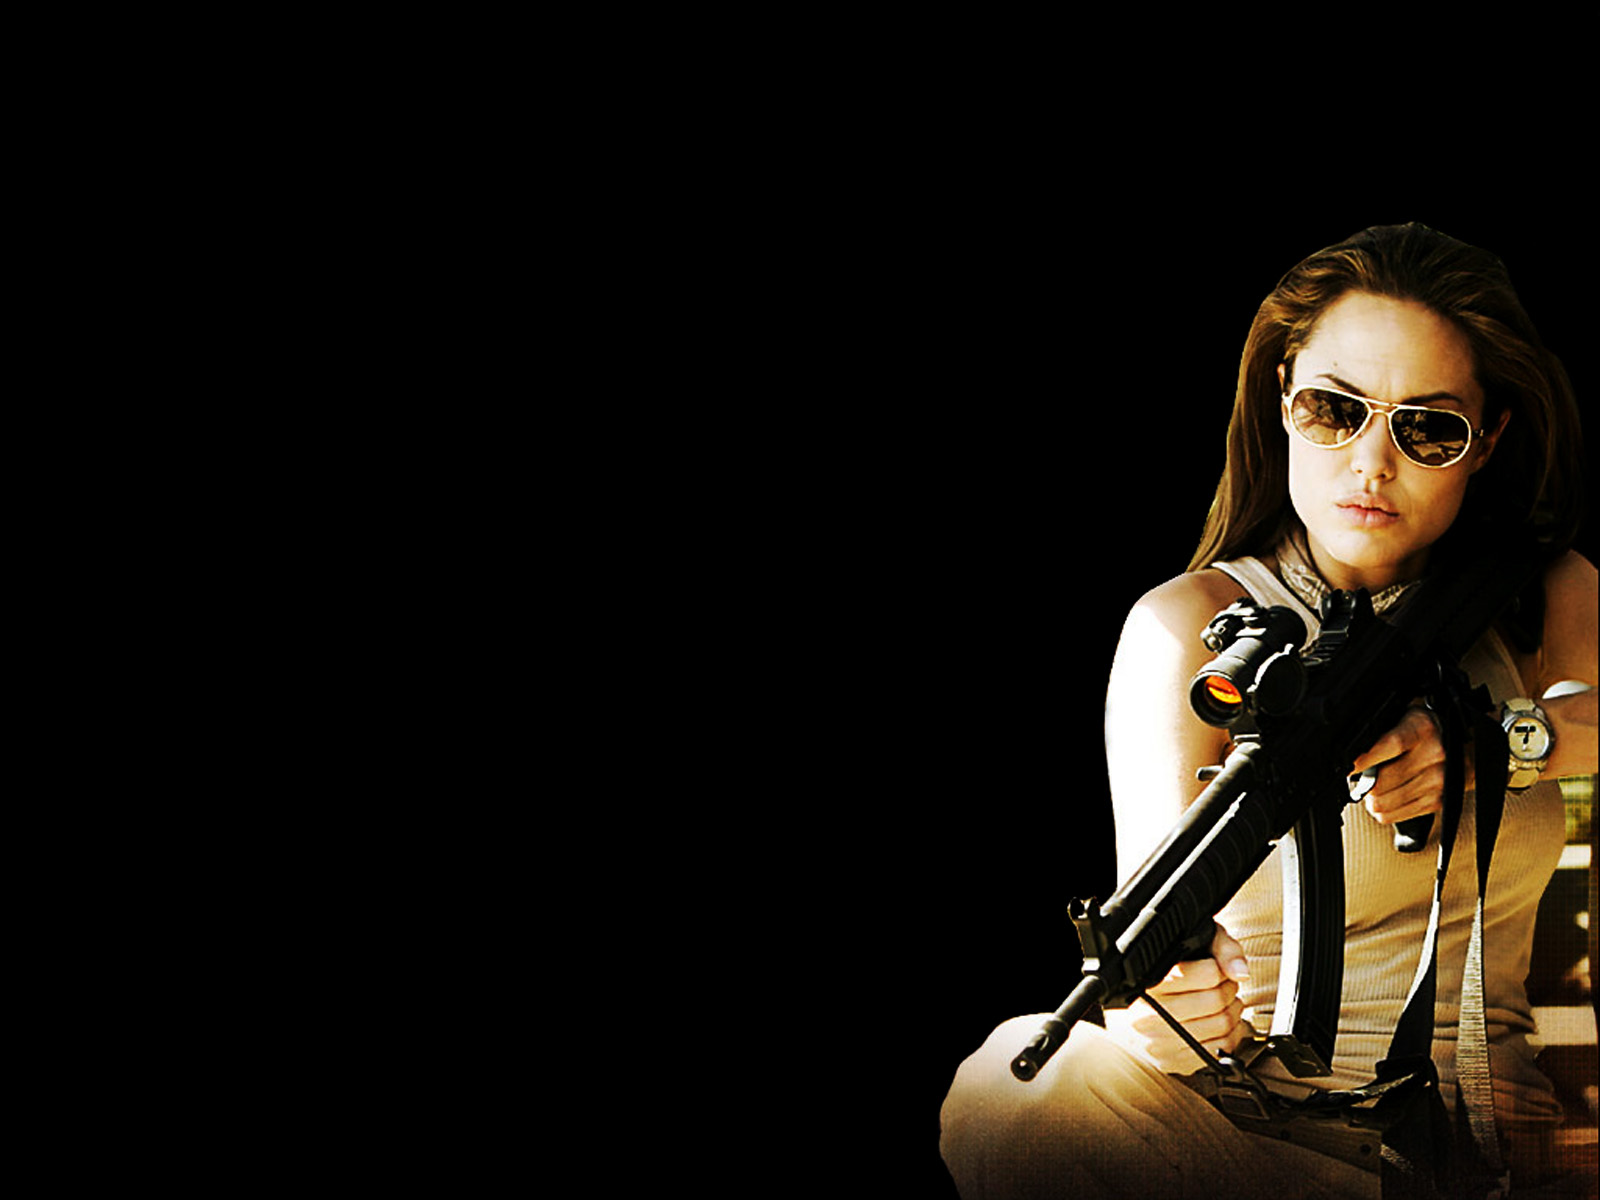 http://1.bp.blogspot.com/-jdWEm4yajZQ/T31rF-0HUMI/AAAAAAAABFs/zzrvmXMP1PI/s1600/Angelina_Jolie_With_Sunglasses_HD_Wallpaper-Vvallpaper.Net.jpg